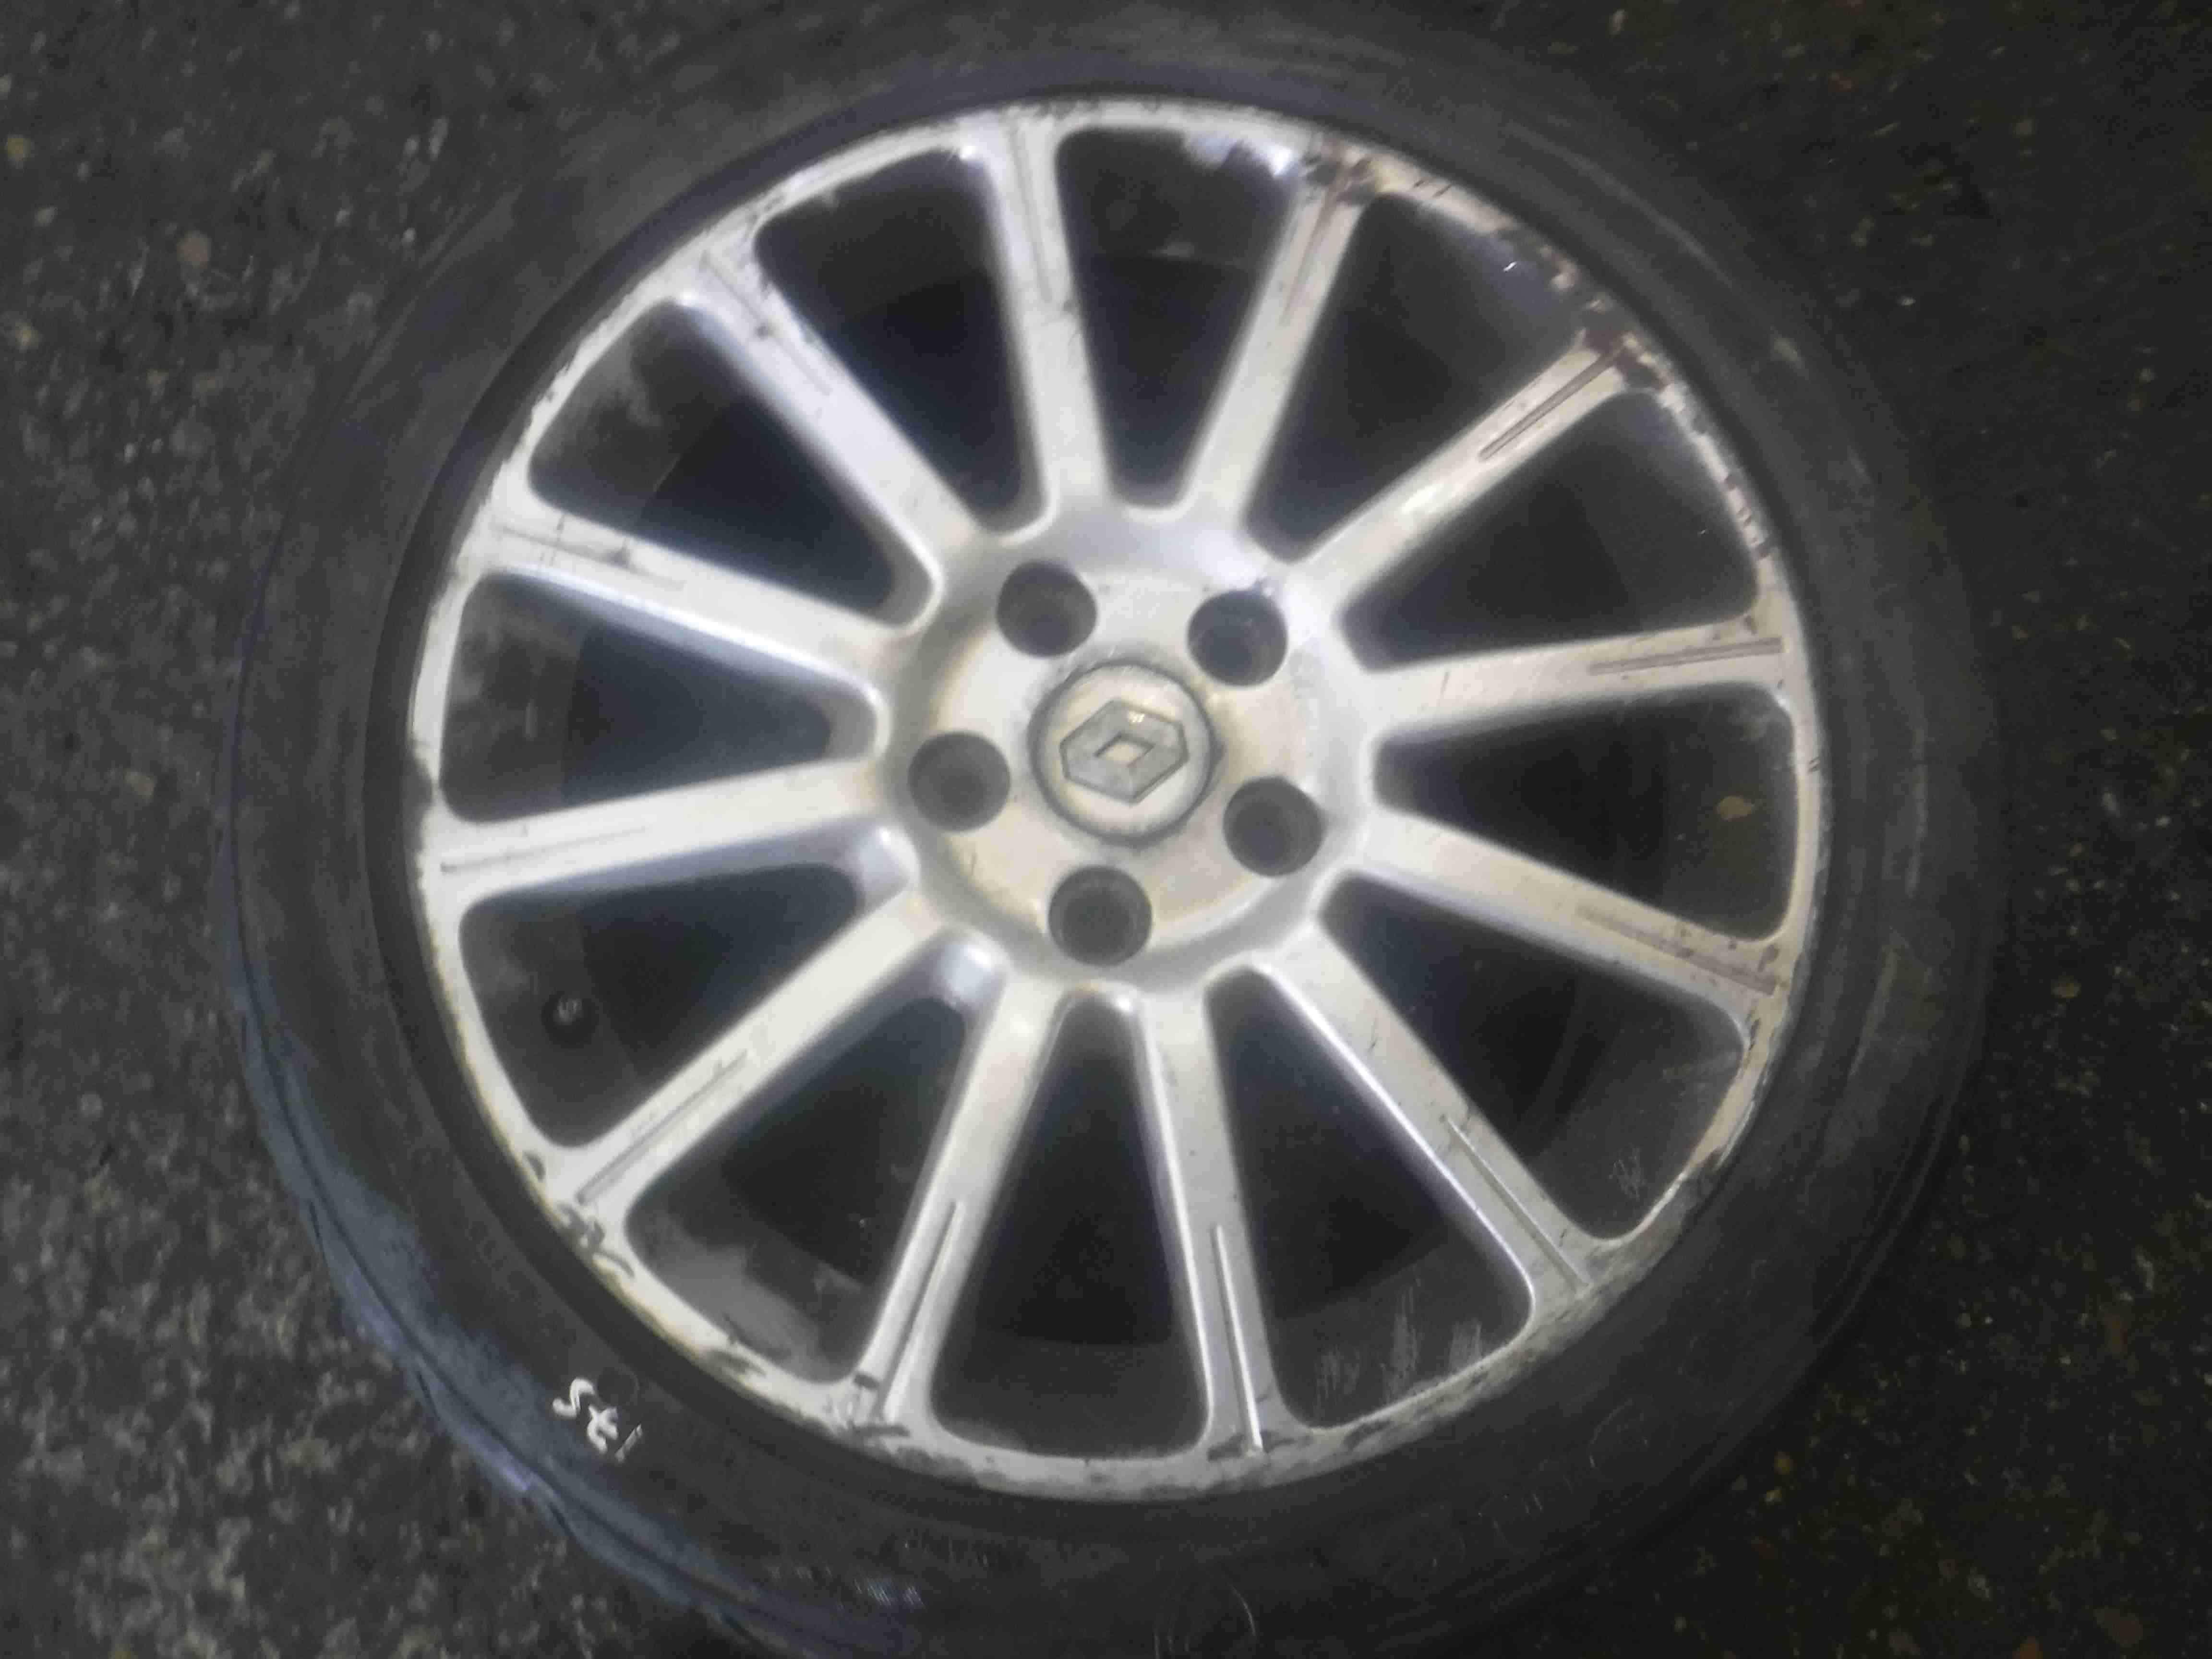 Renault Megane Sport 175 2002-2008 Alloy Wheel 17inch X1 + Tyre 225 45 17 5mm